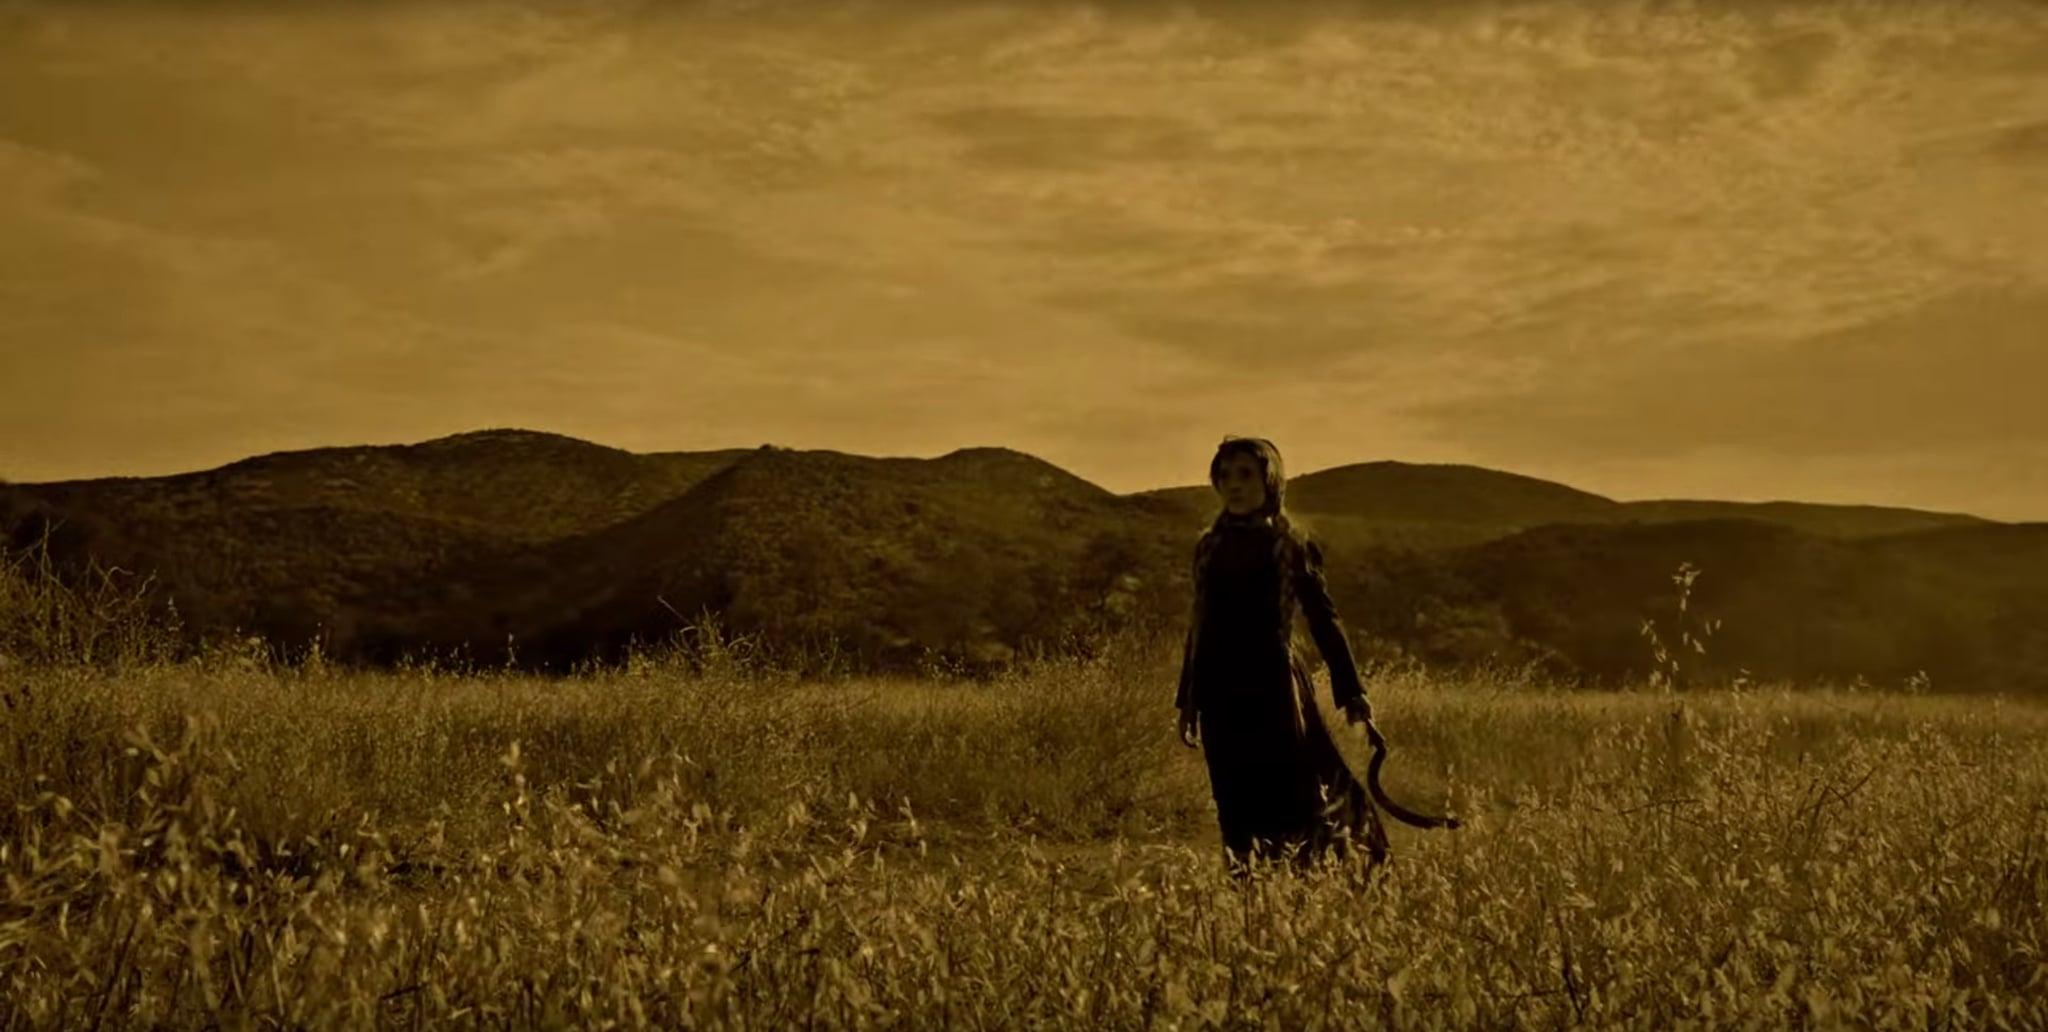 American Horror Story Season 3 DVD Release Date | Redbox, Netflix ...